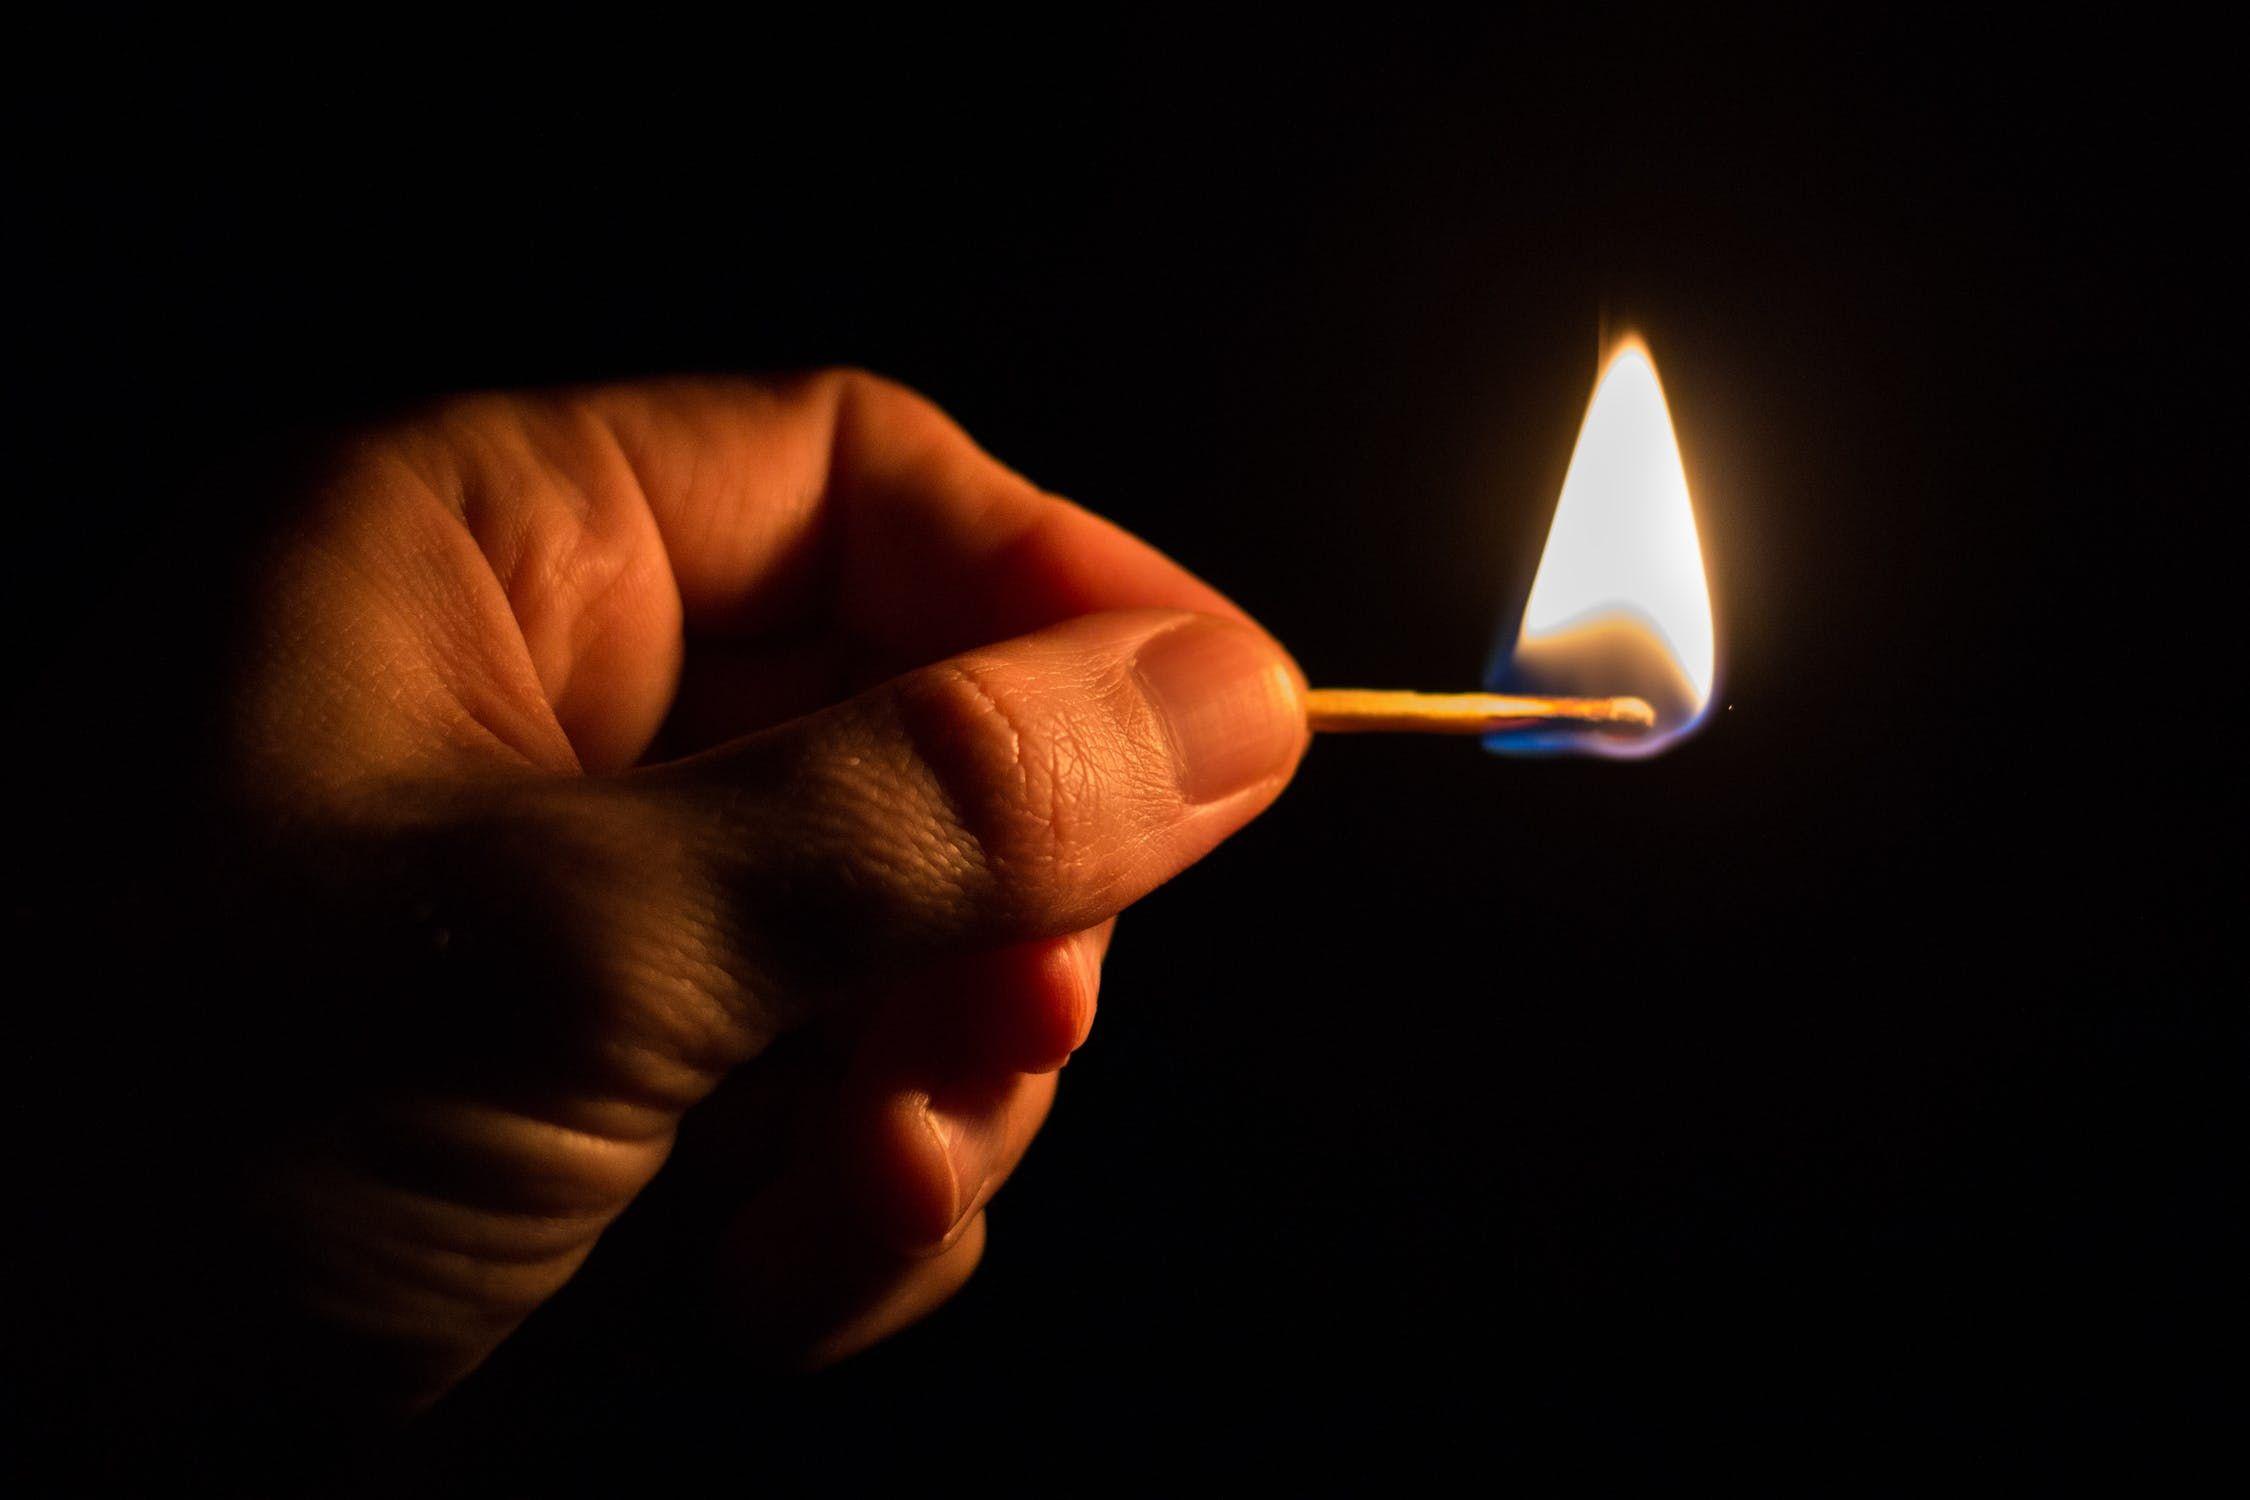 energy-of-technology-consumption-light-159466.jpeg